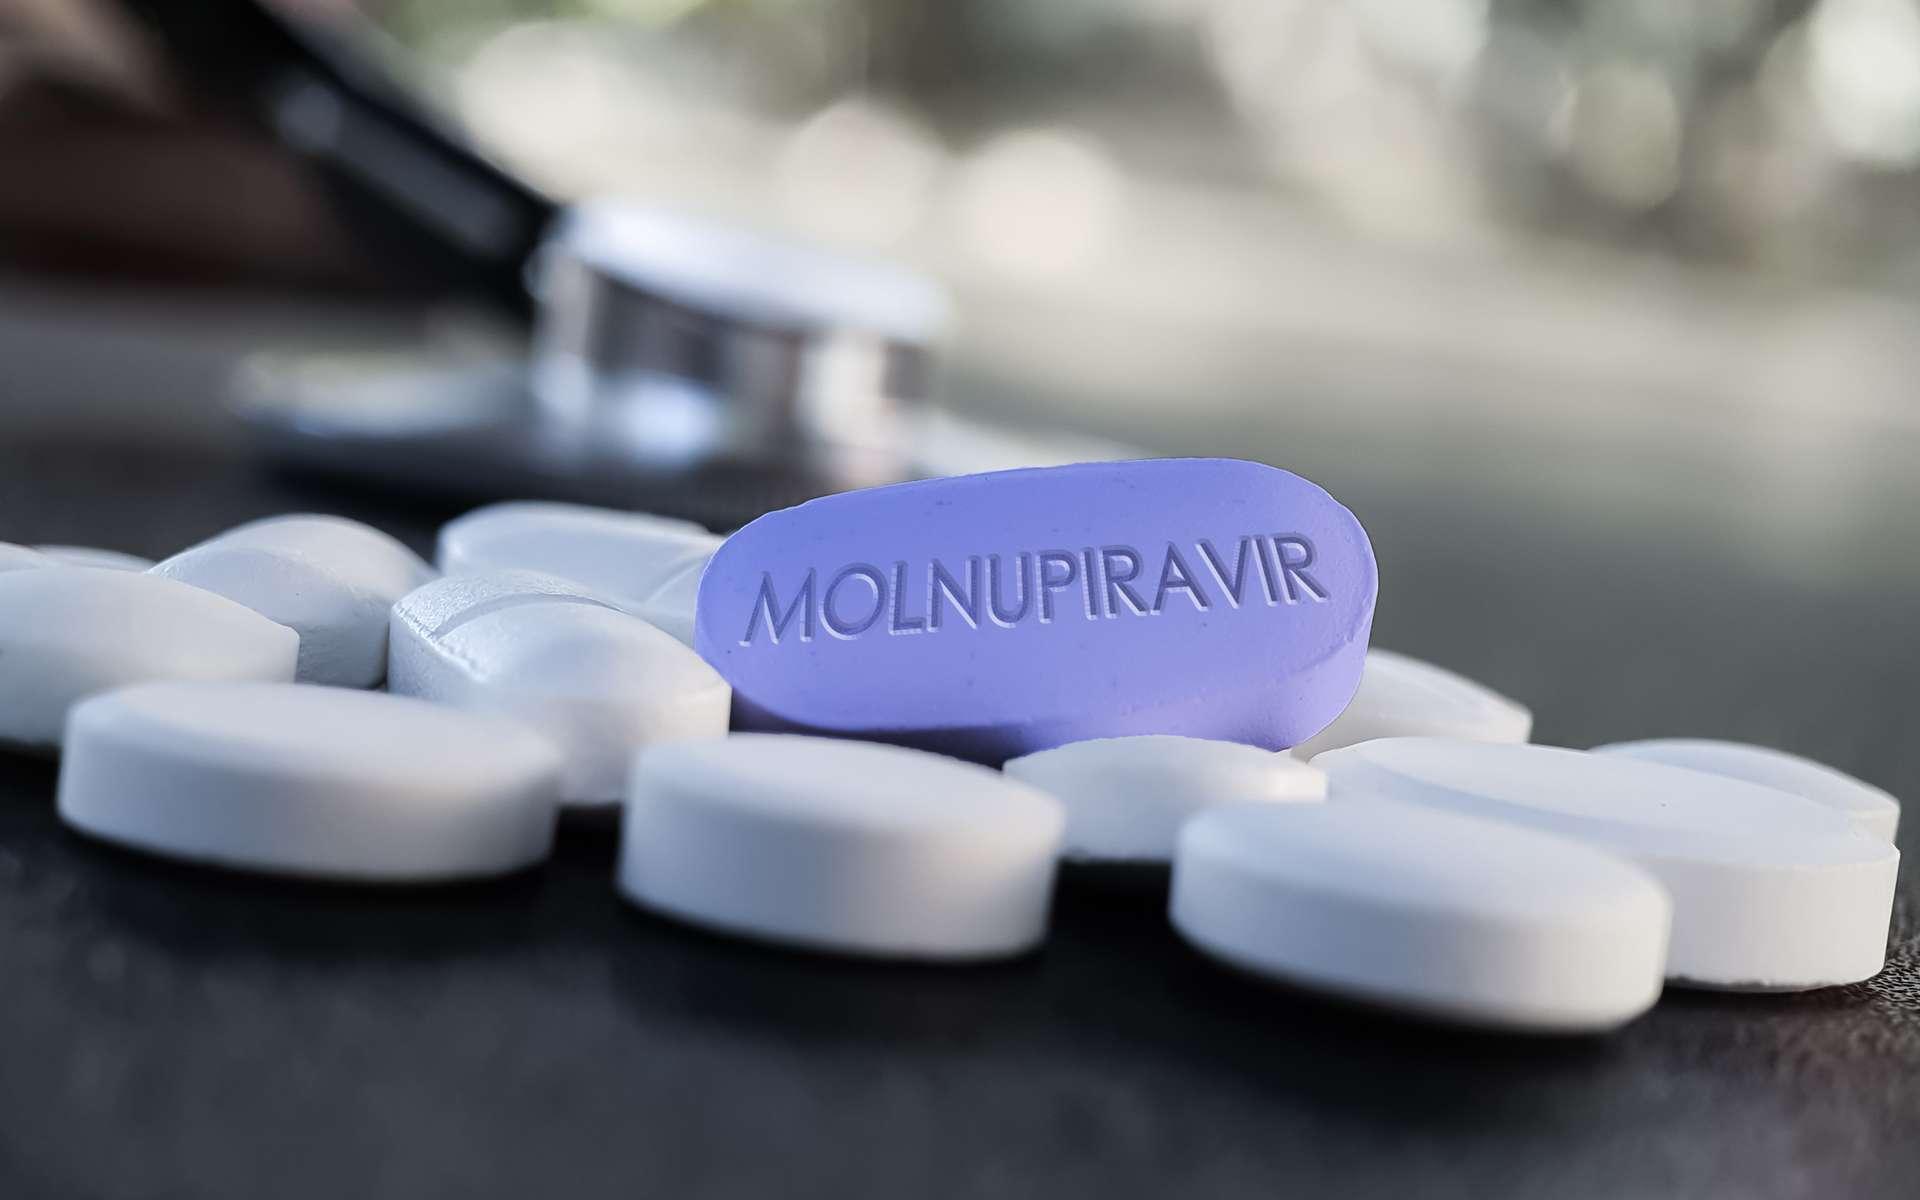 Le Molnupiravir limite la propagation du coronavirus en 24 heures. © Soni's, Adobe Stock